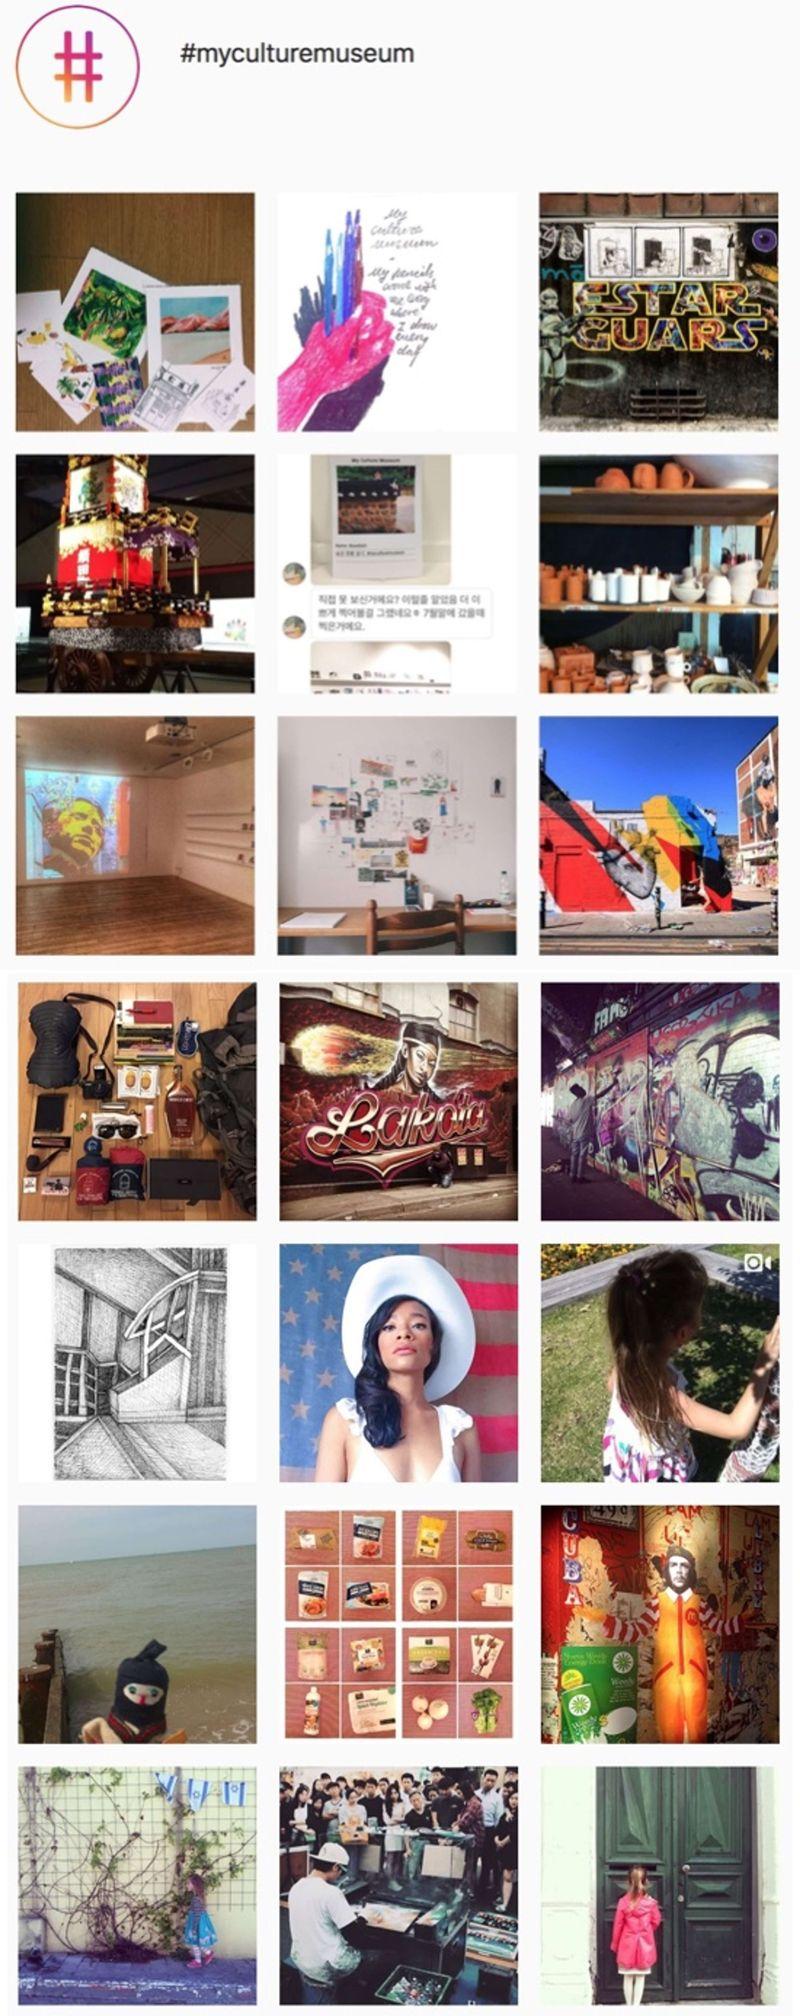 My Culture Museum